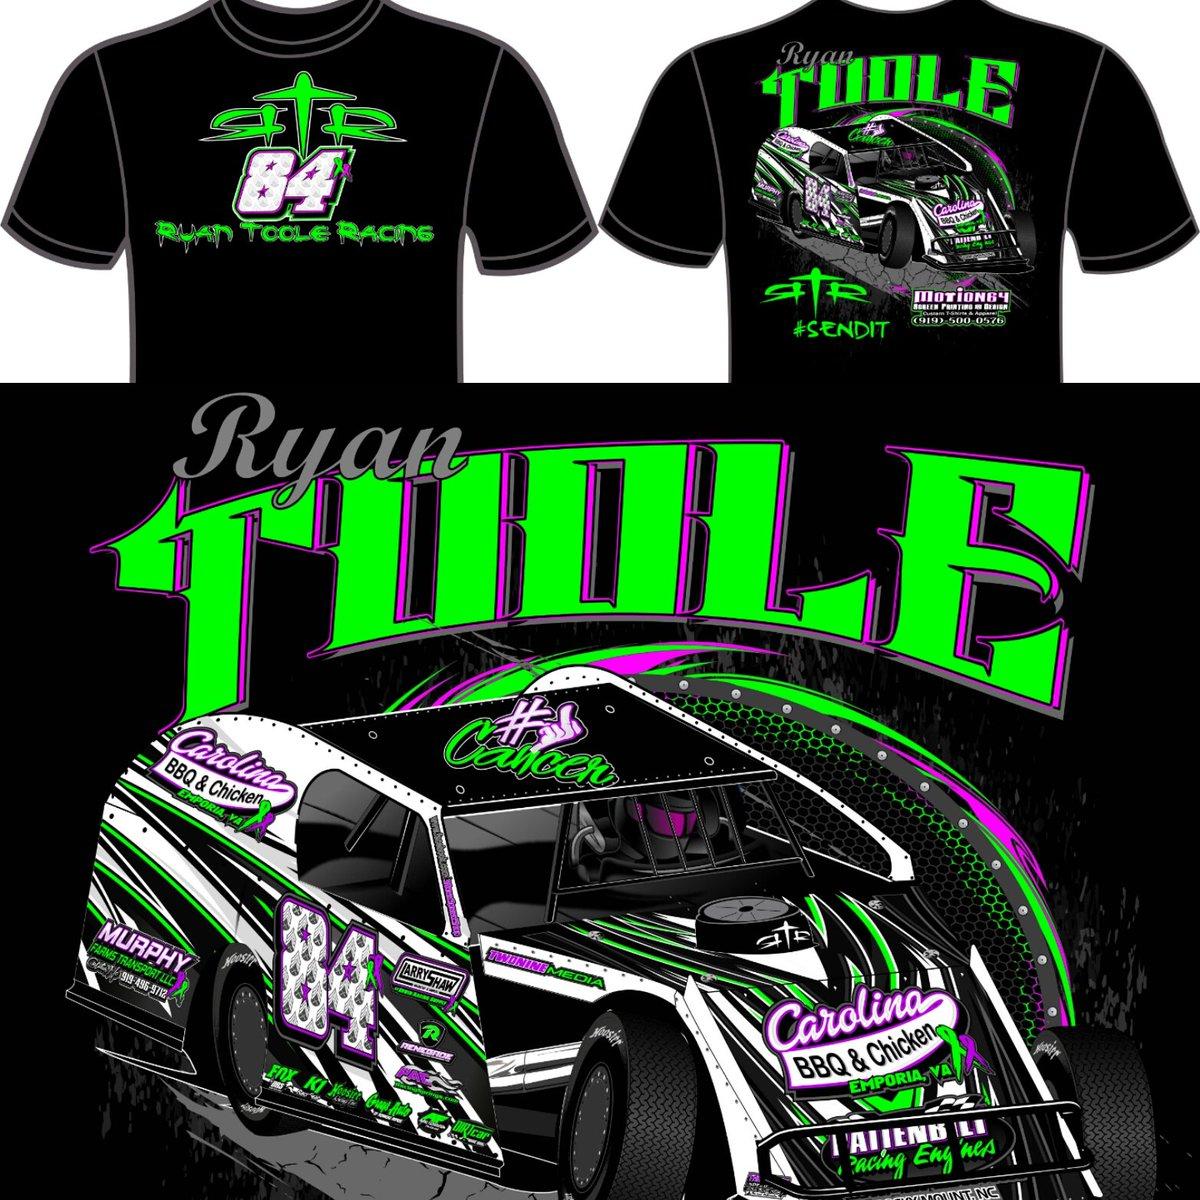 Stock Car Racing T Shirt Designs Rldm